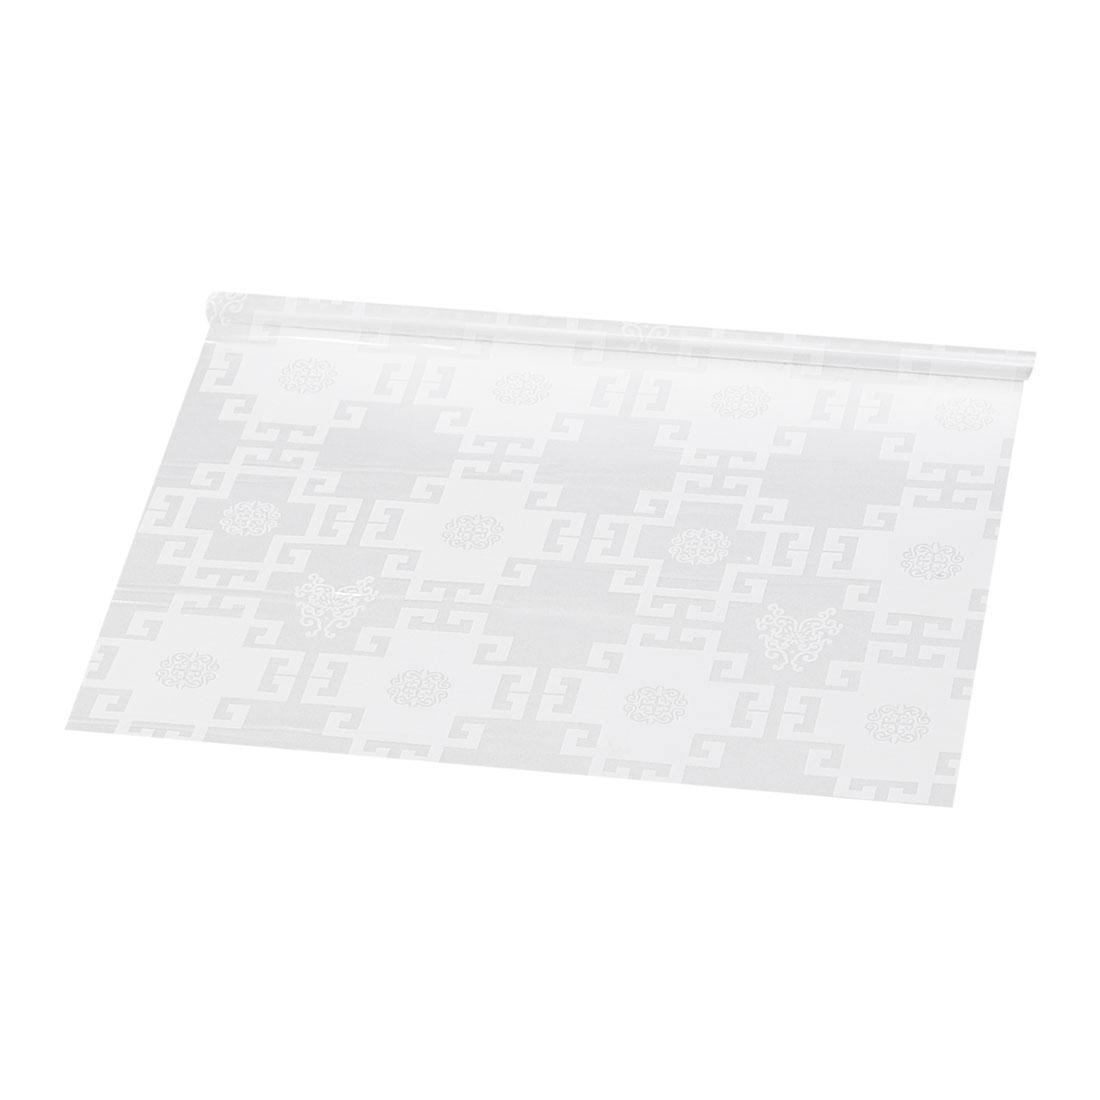 "Self-sticky 23.6"" x 78.7"" Water Resistant Window Film Retro Building Pattern"